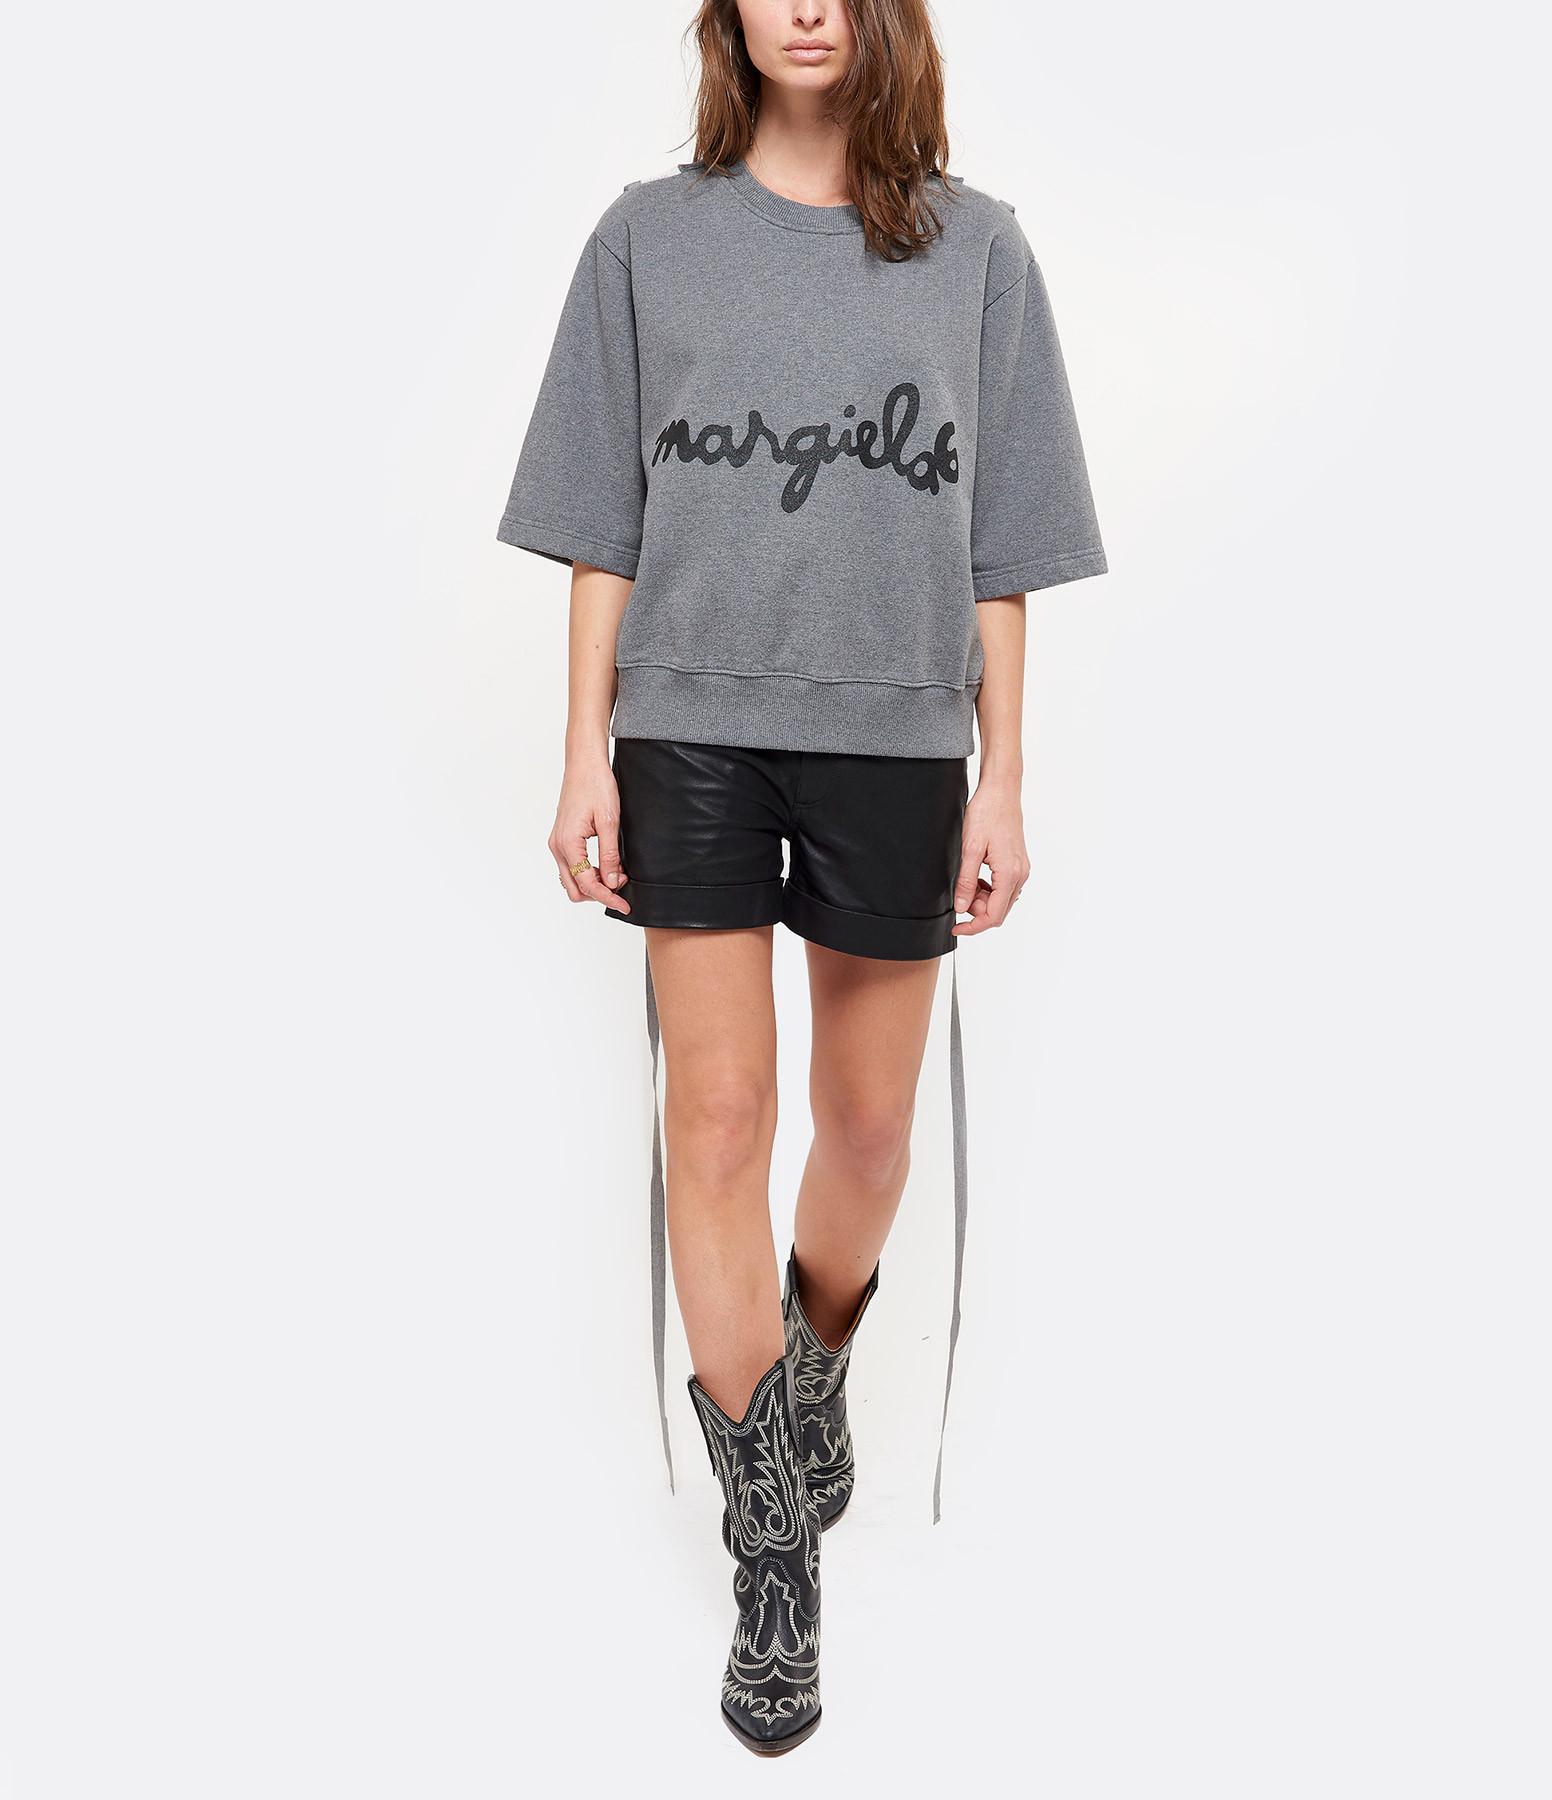 MM6 MAISON MARGIELA - Sweatshirt Ruban Coton Gris Chiné